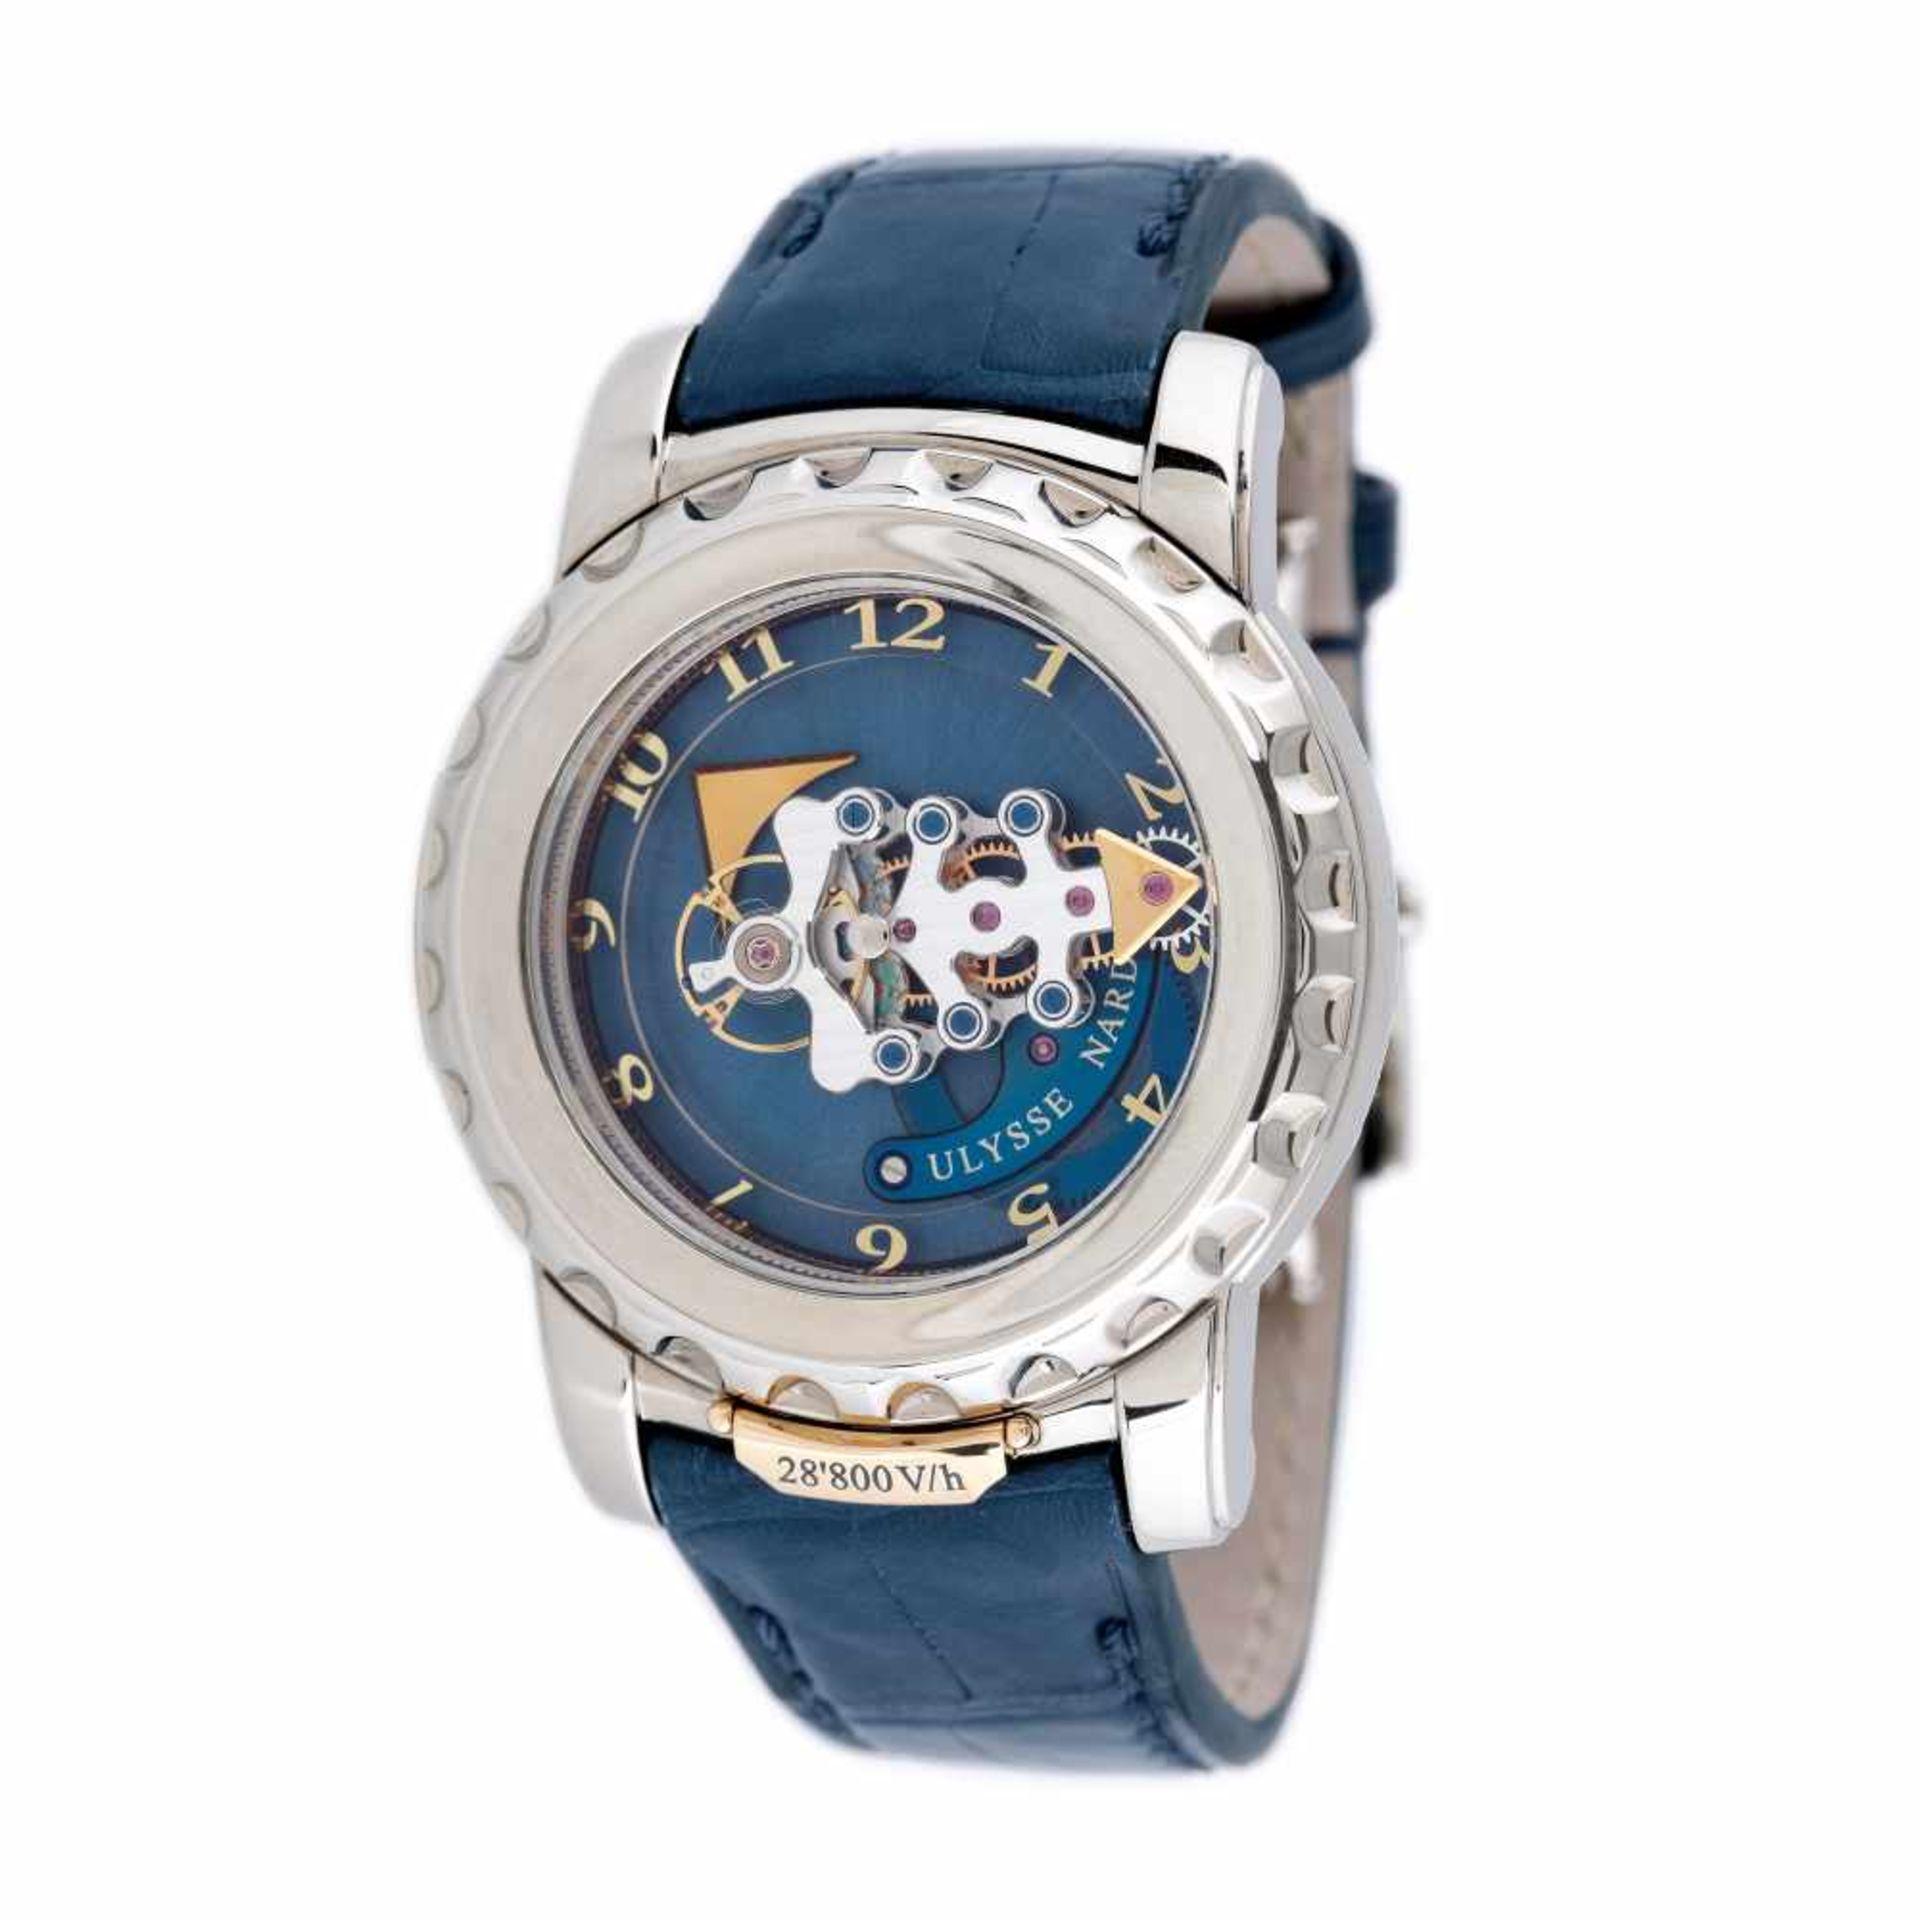 Ulysse Nardin Freak Vision Tourbillion wristwatch, white gold, men, provenance documents and origina